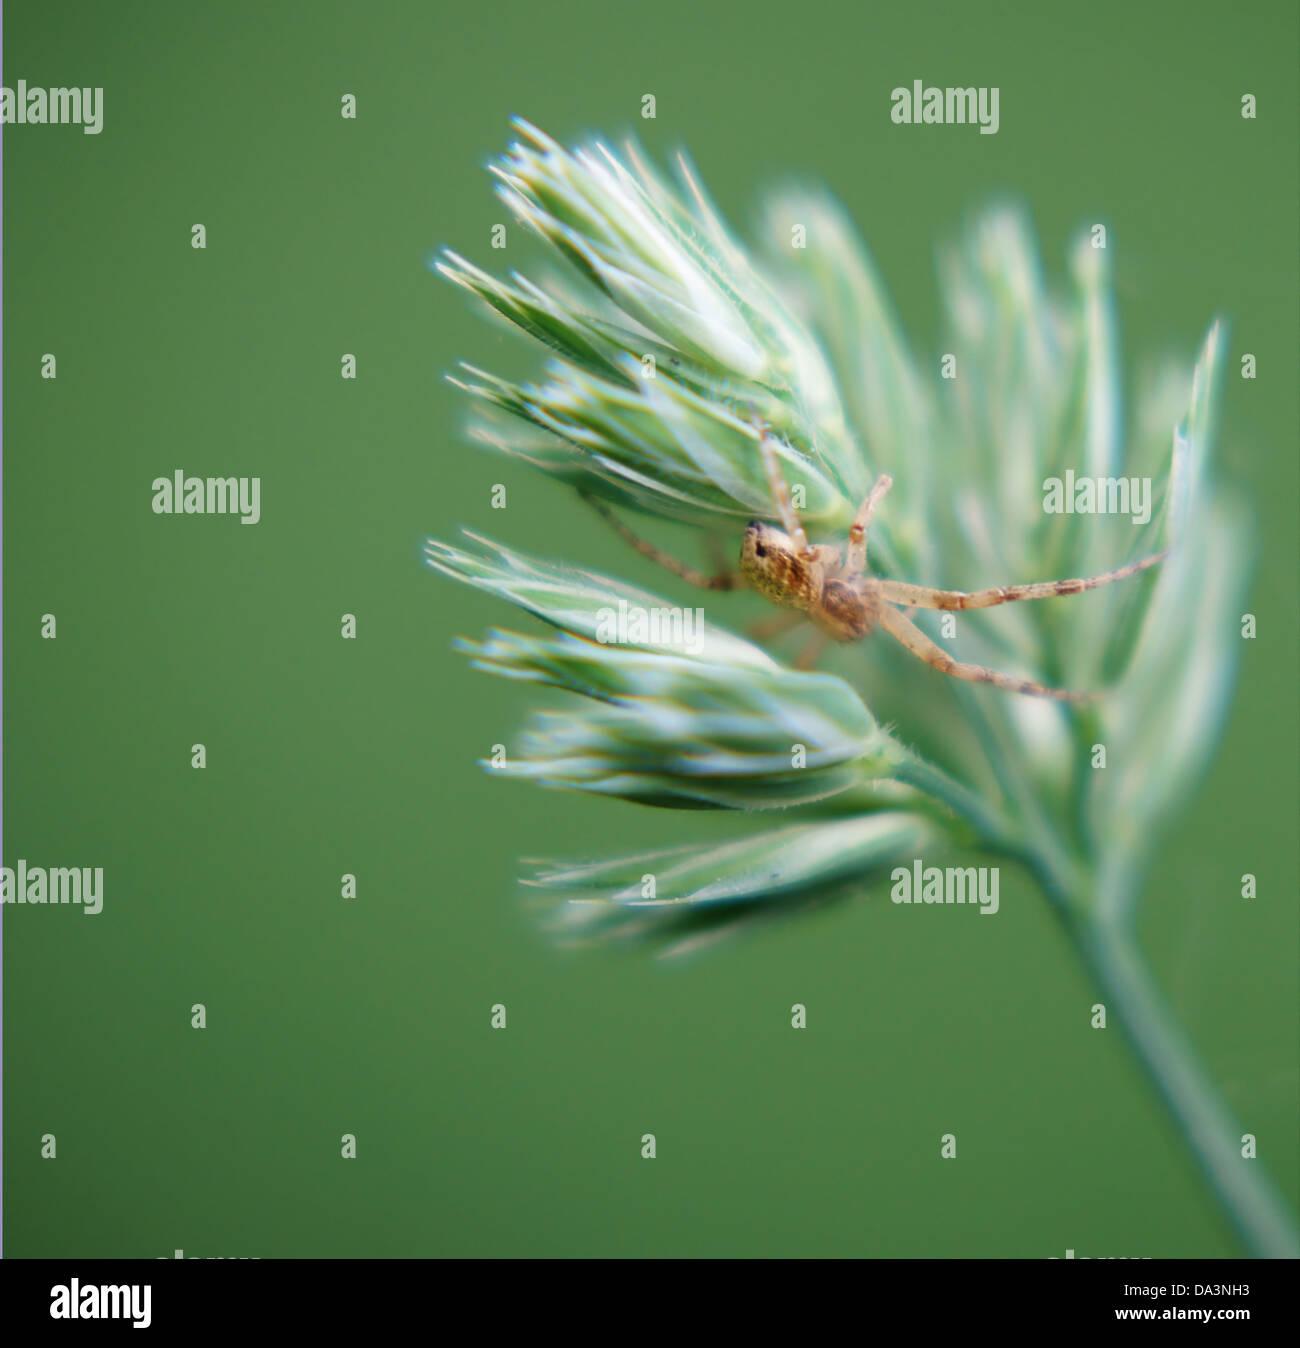 Spiders hiding - Stock Image